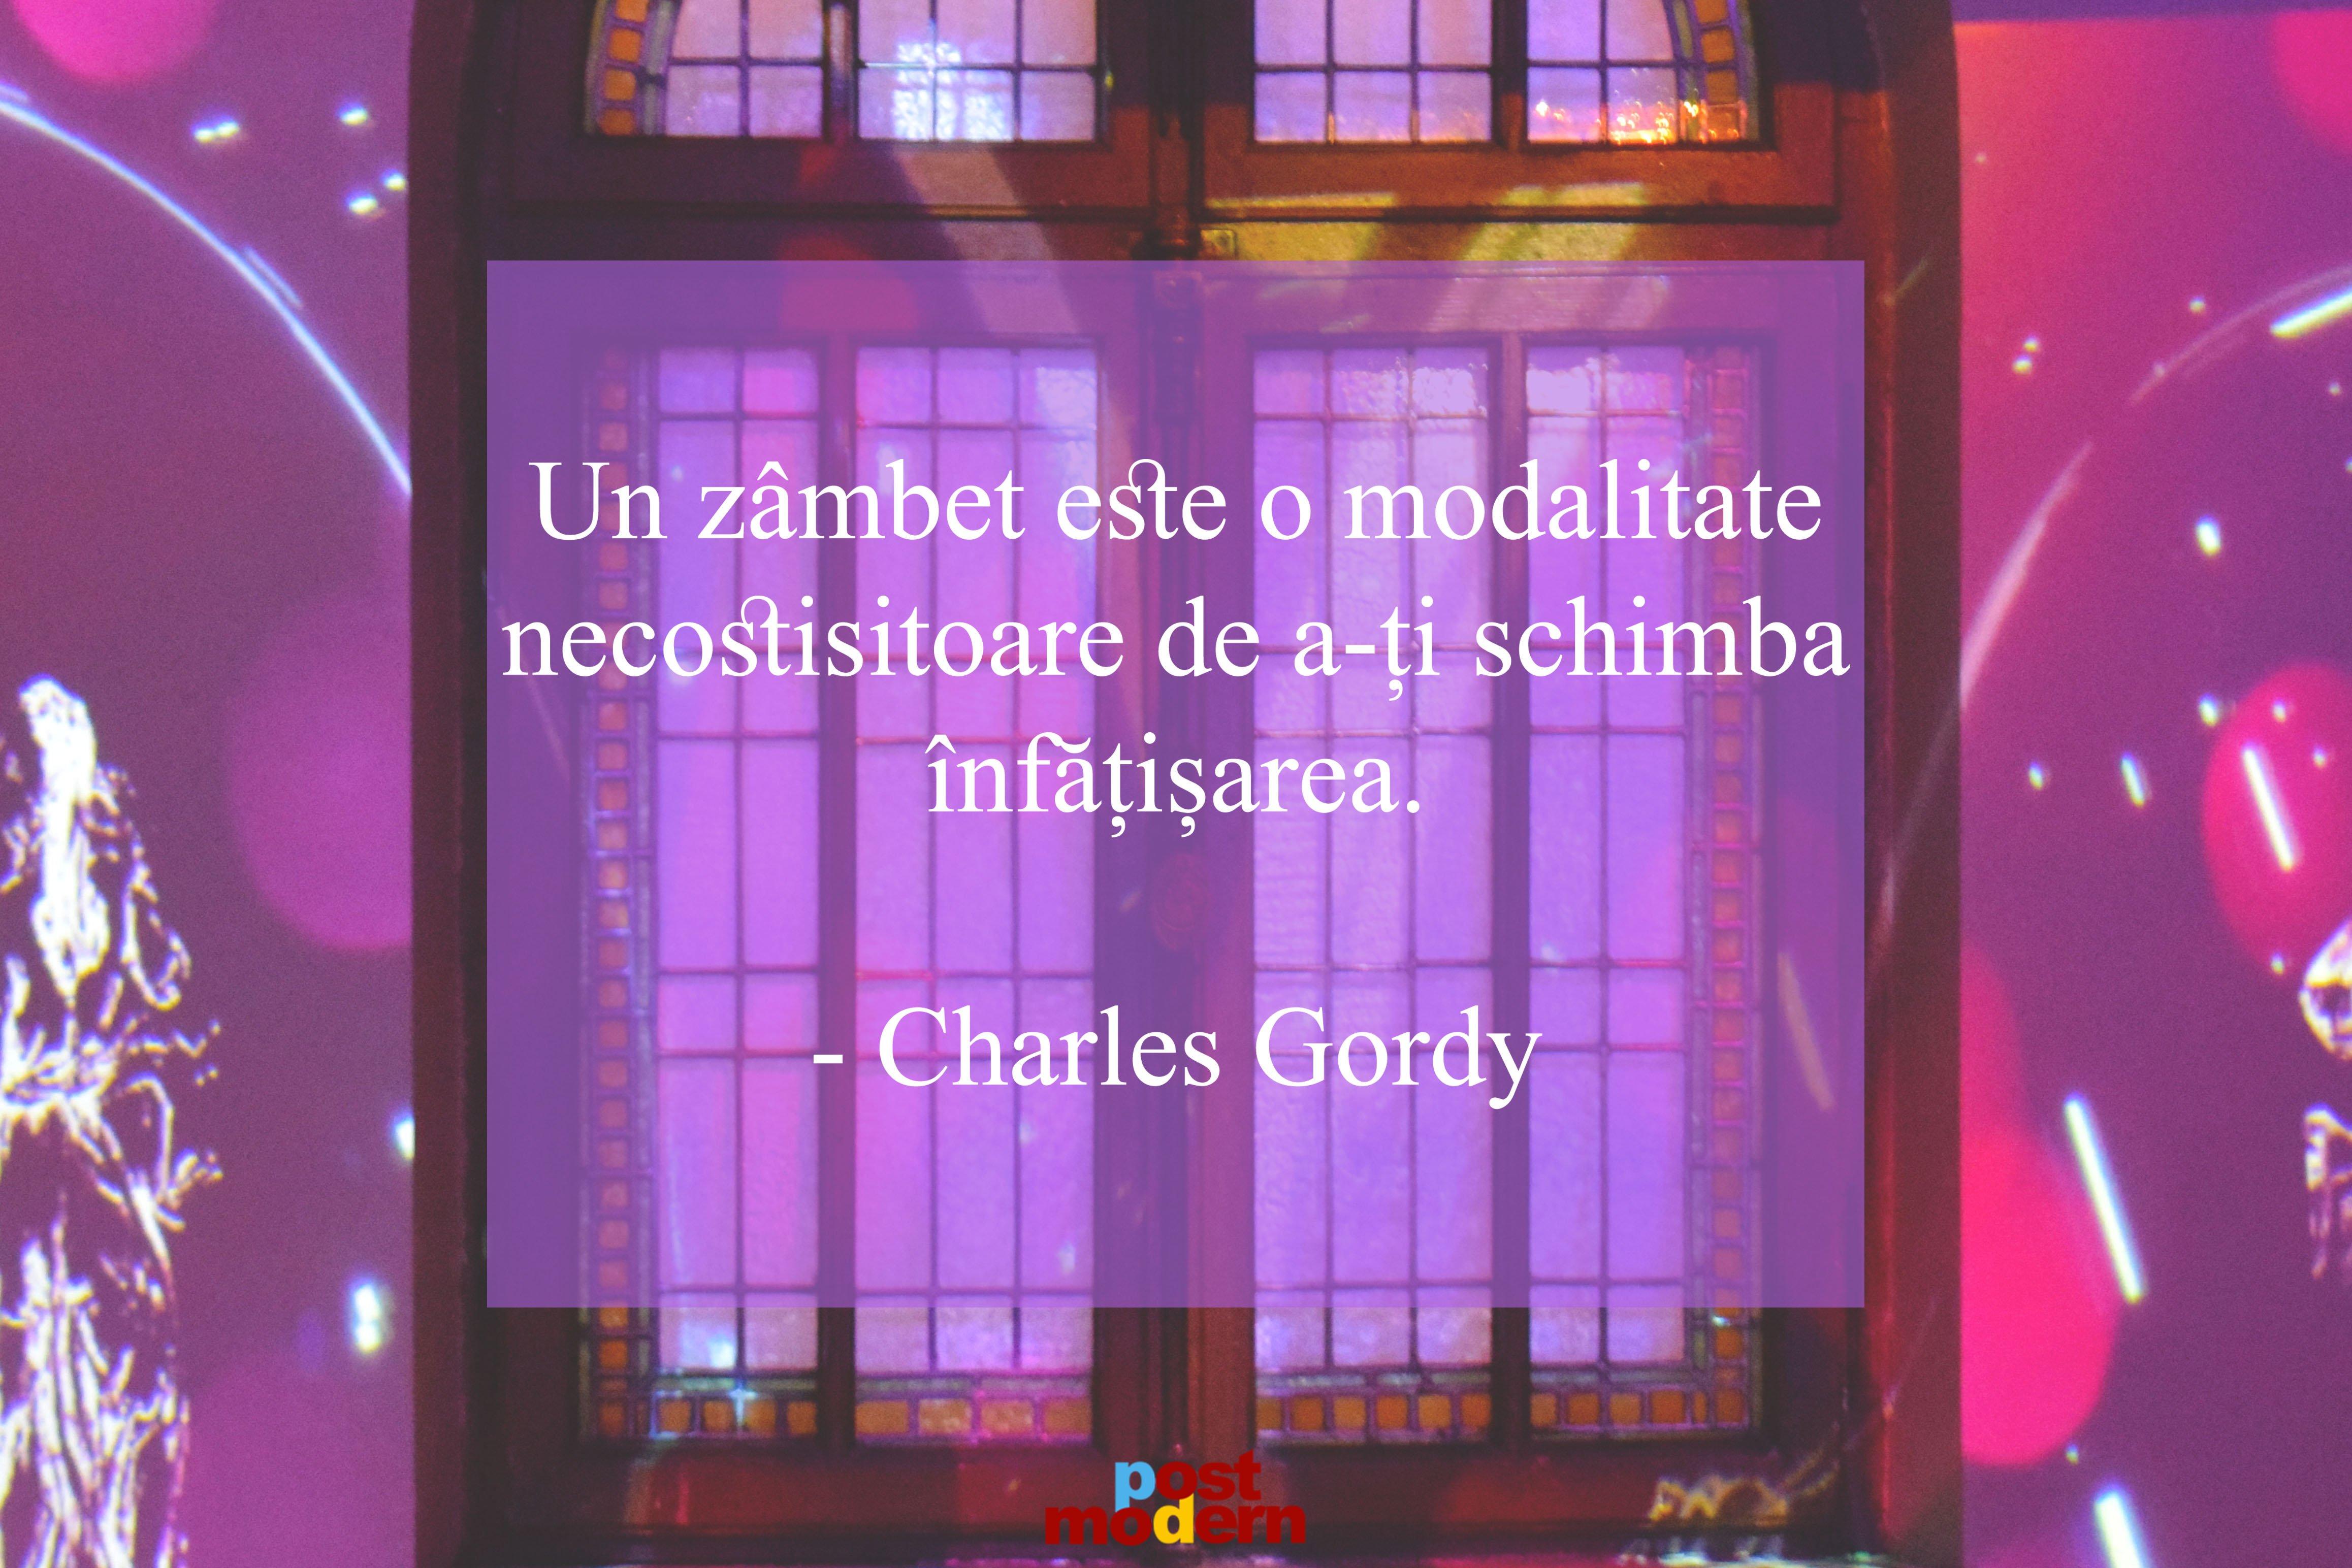 charles gordy citate zambete